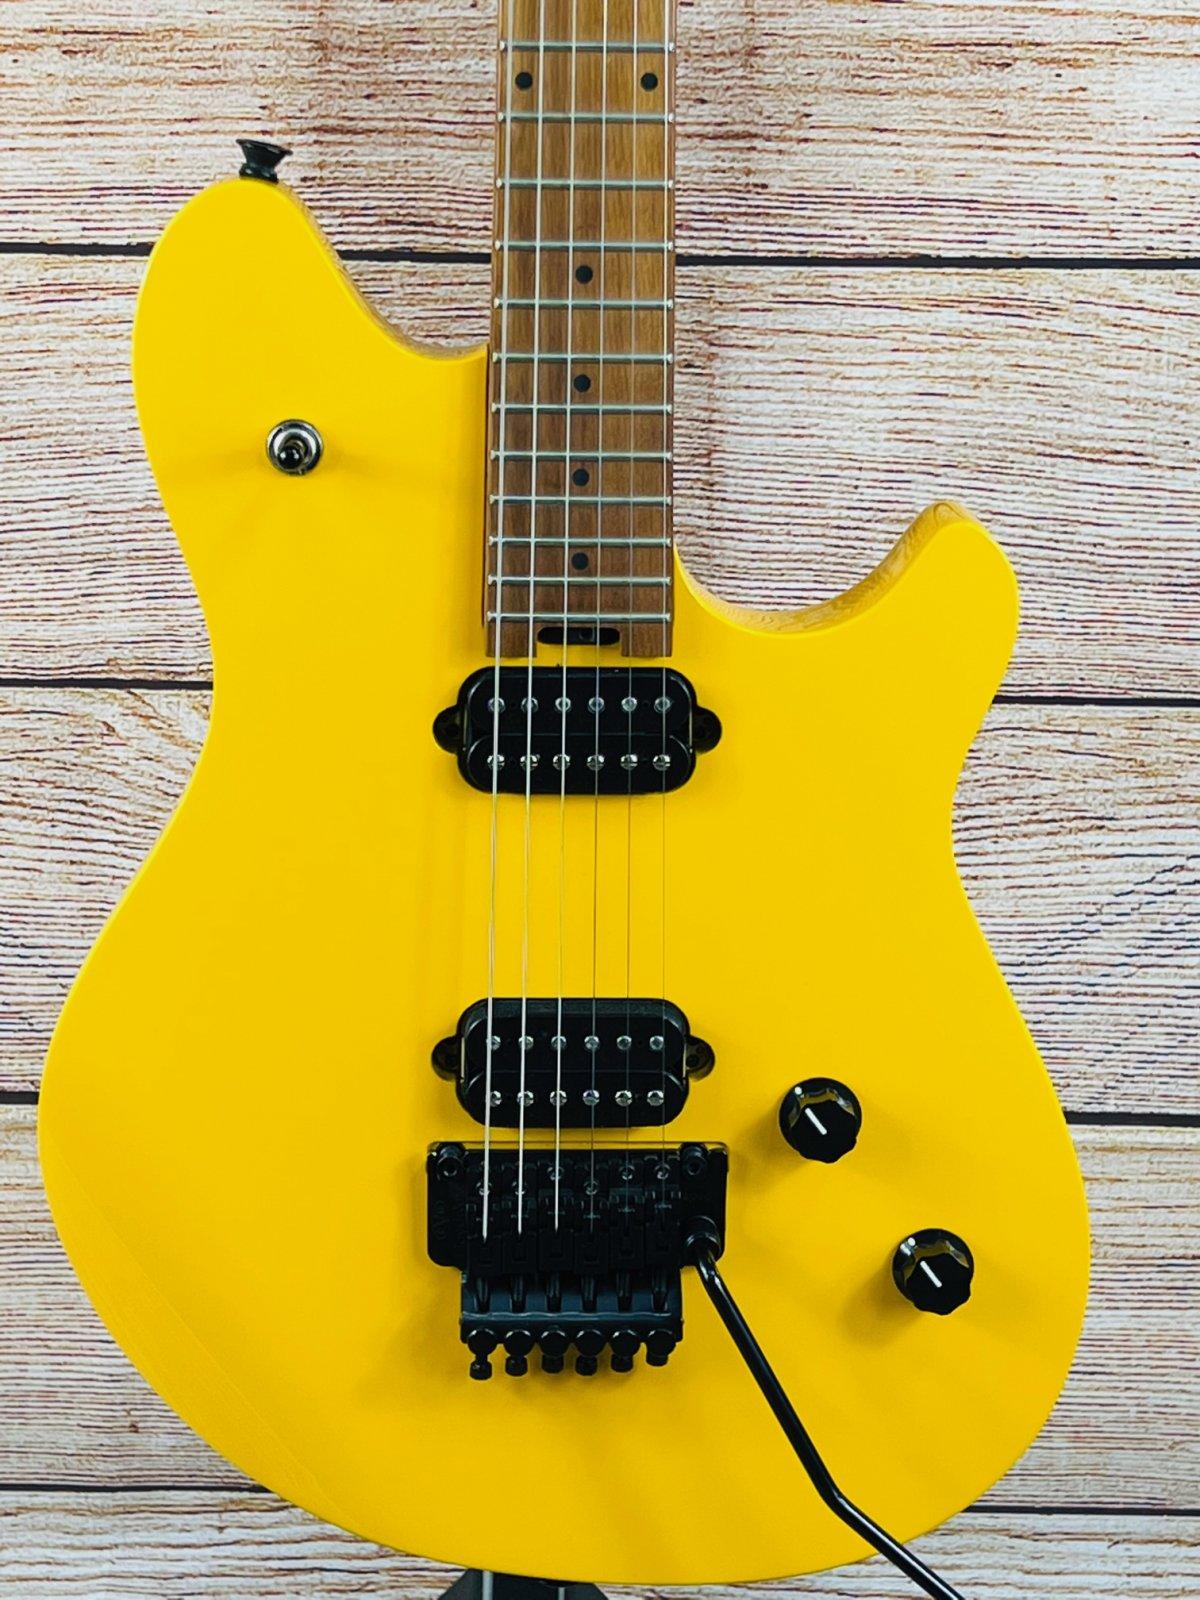 EVH Wolfgang Standard Electric Guitar- Taxi Cab yellow w/gigbag